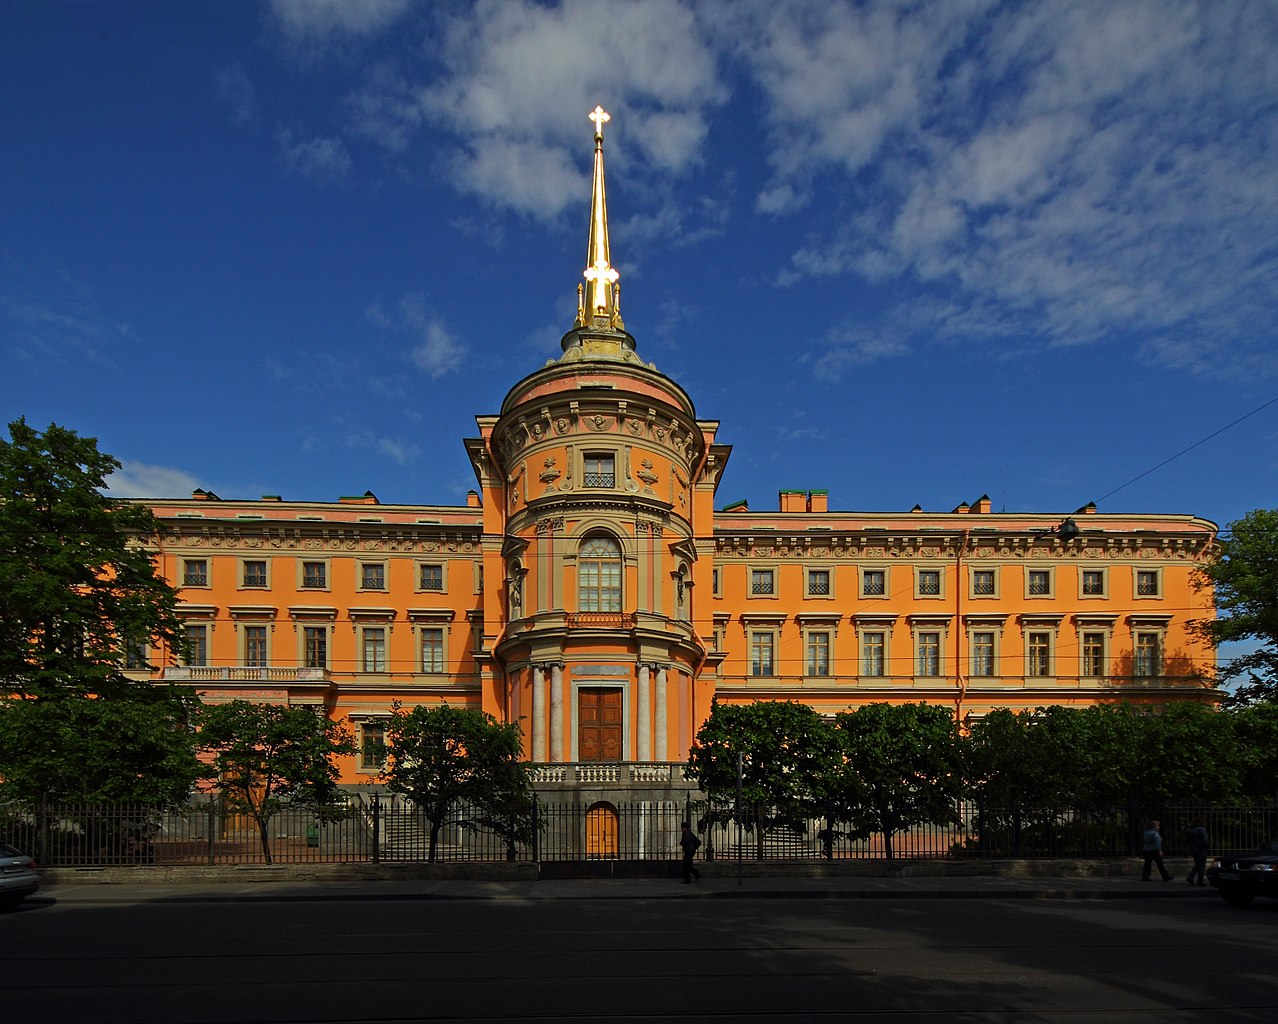 Михайловский (Инженерный) замок, Русский музей. Фото: A.Savin (Wikimedia Commons · WikiPhotoSpace)